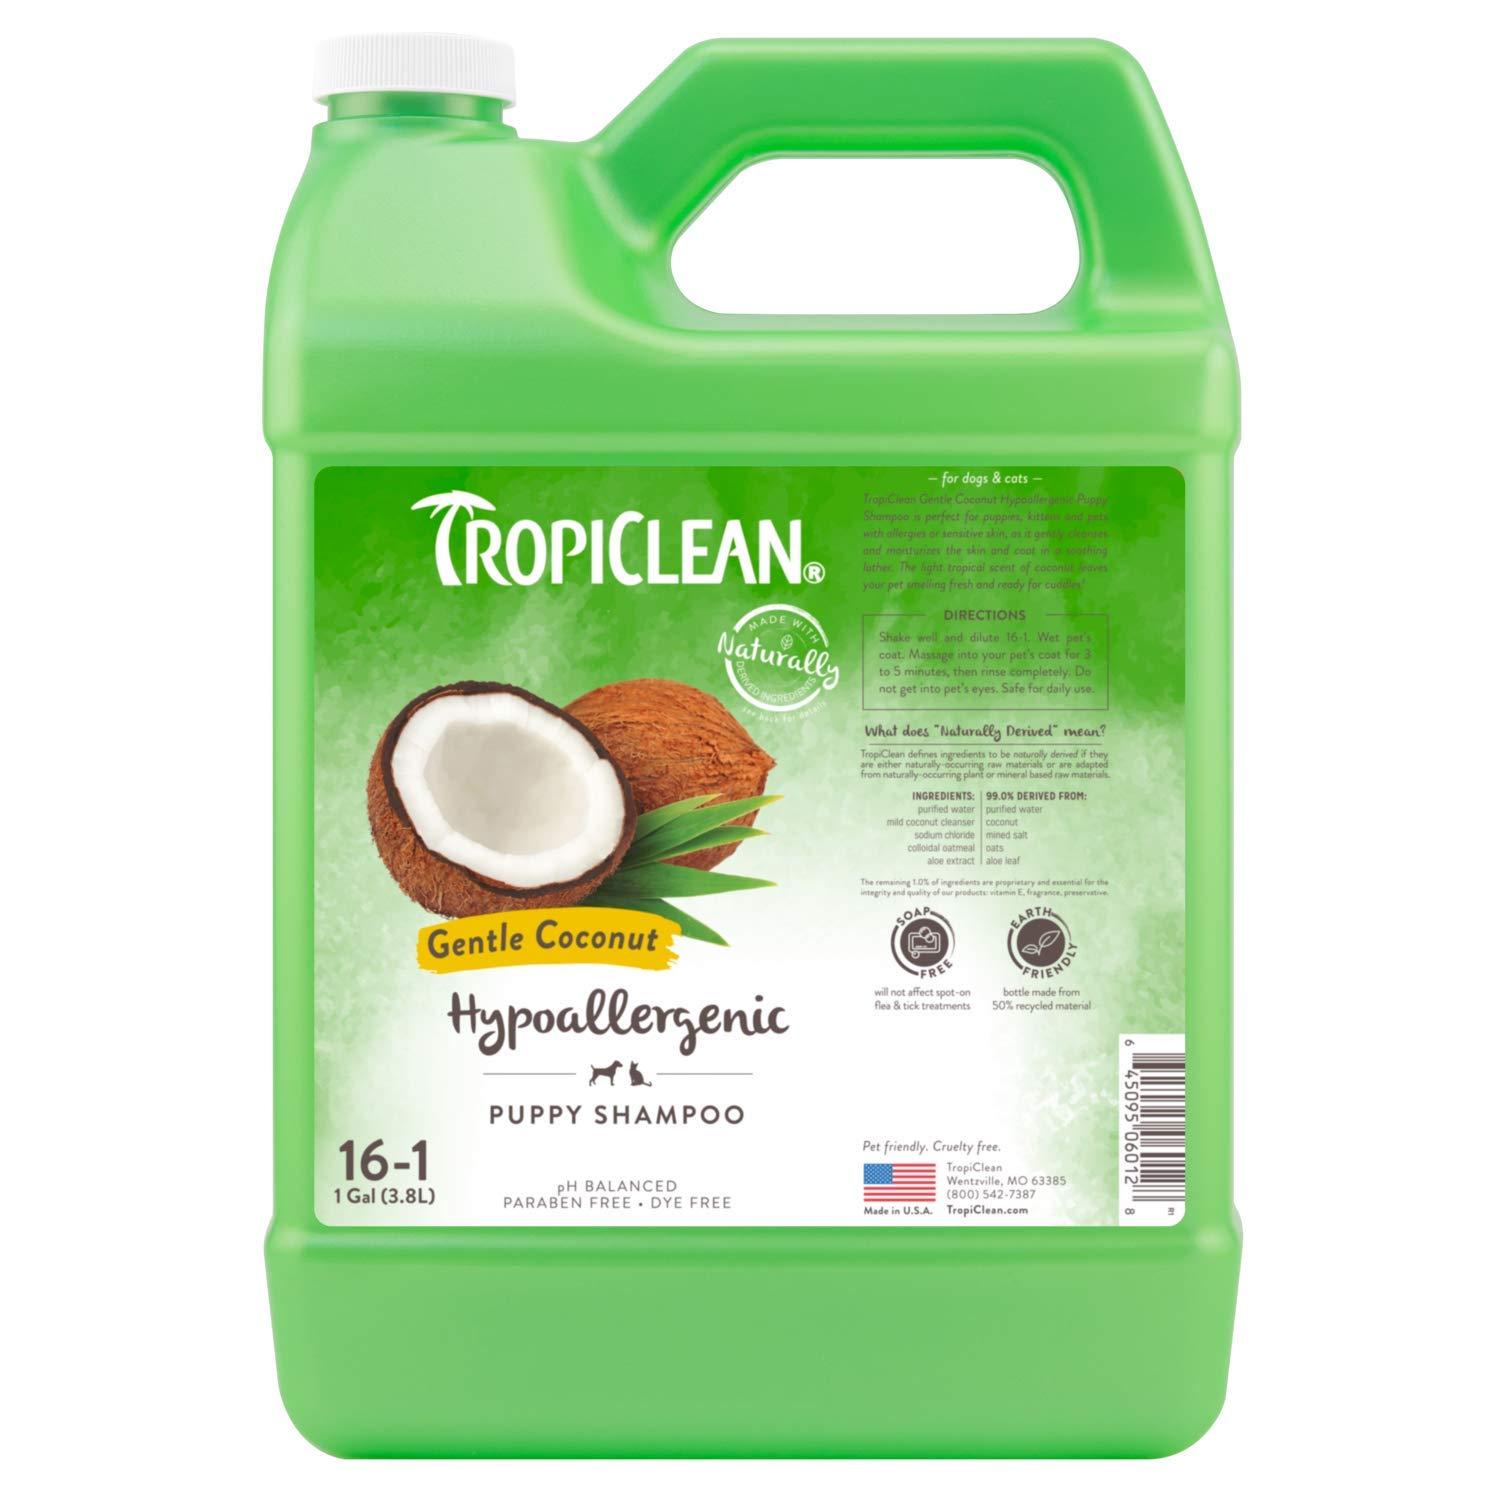 TropiClean Gentle Coconut Hypoallergenic Puppy Shampoo, 1 Gallon